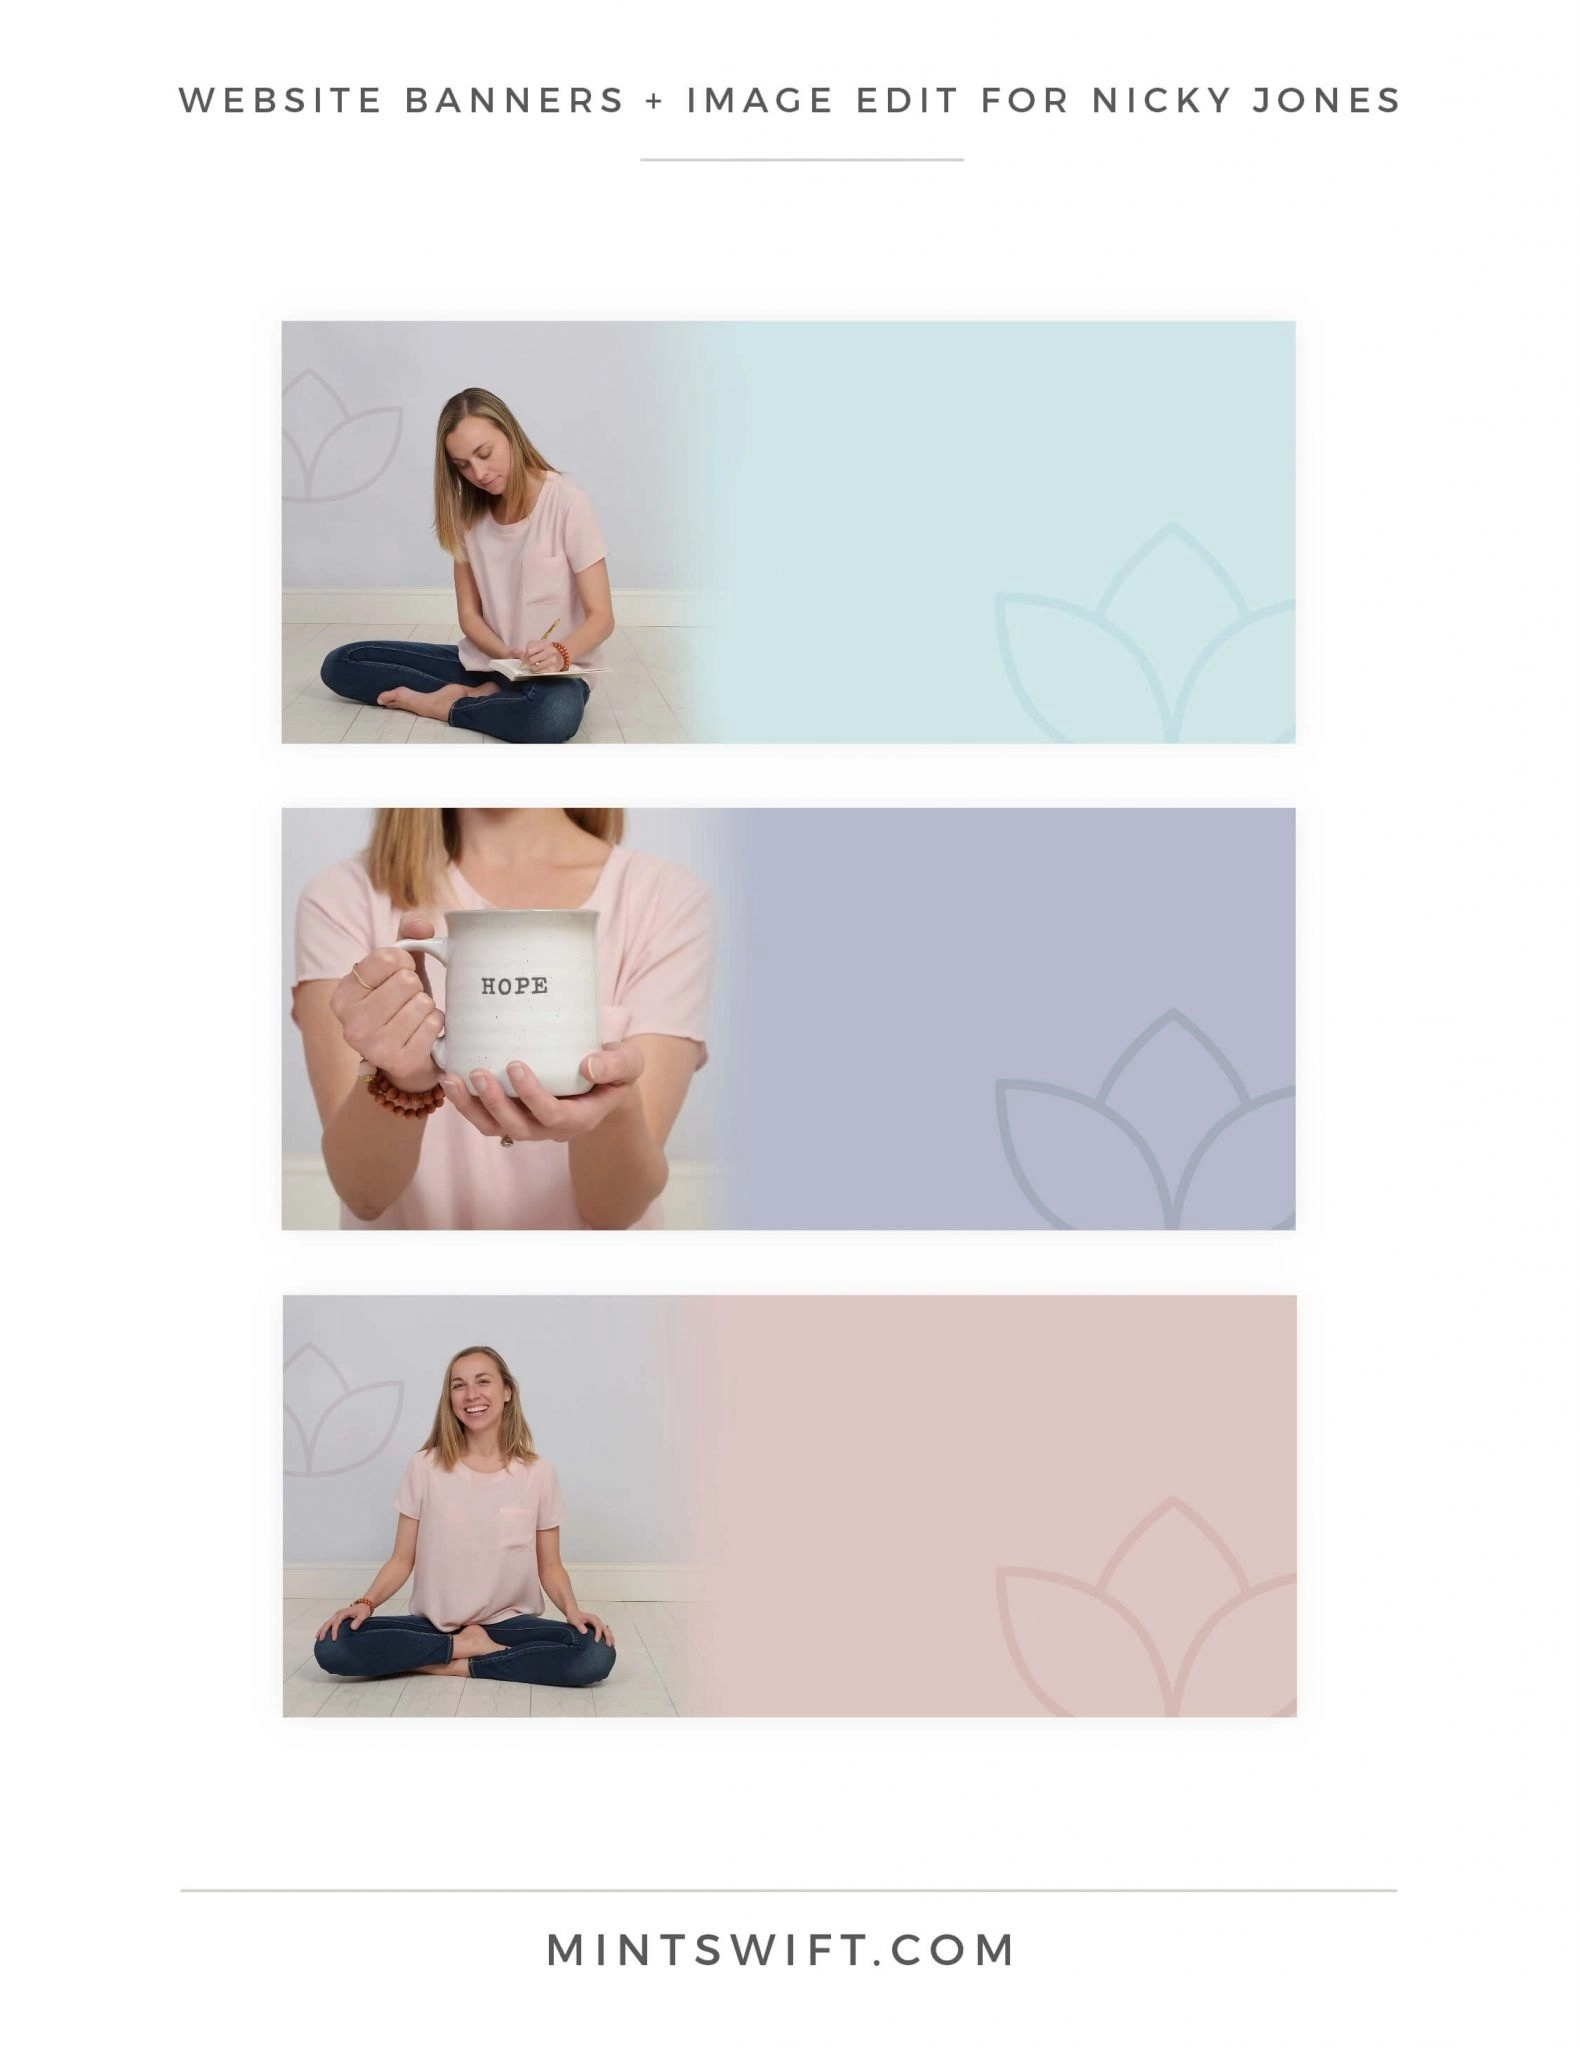 Nicky Jones - Website Banners + Image Edit - Brand Design Package - MintSwift